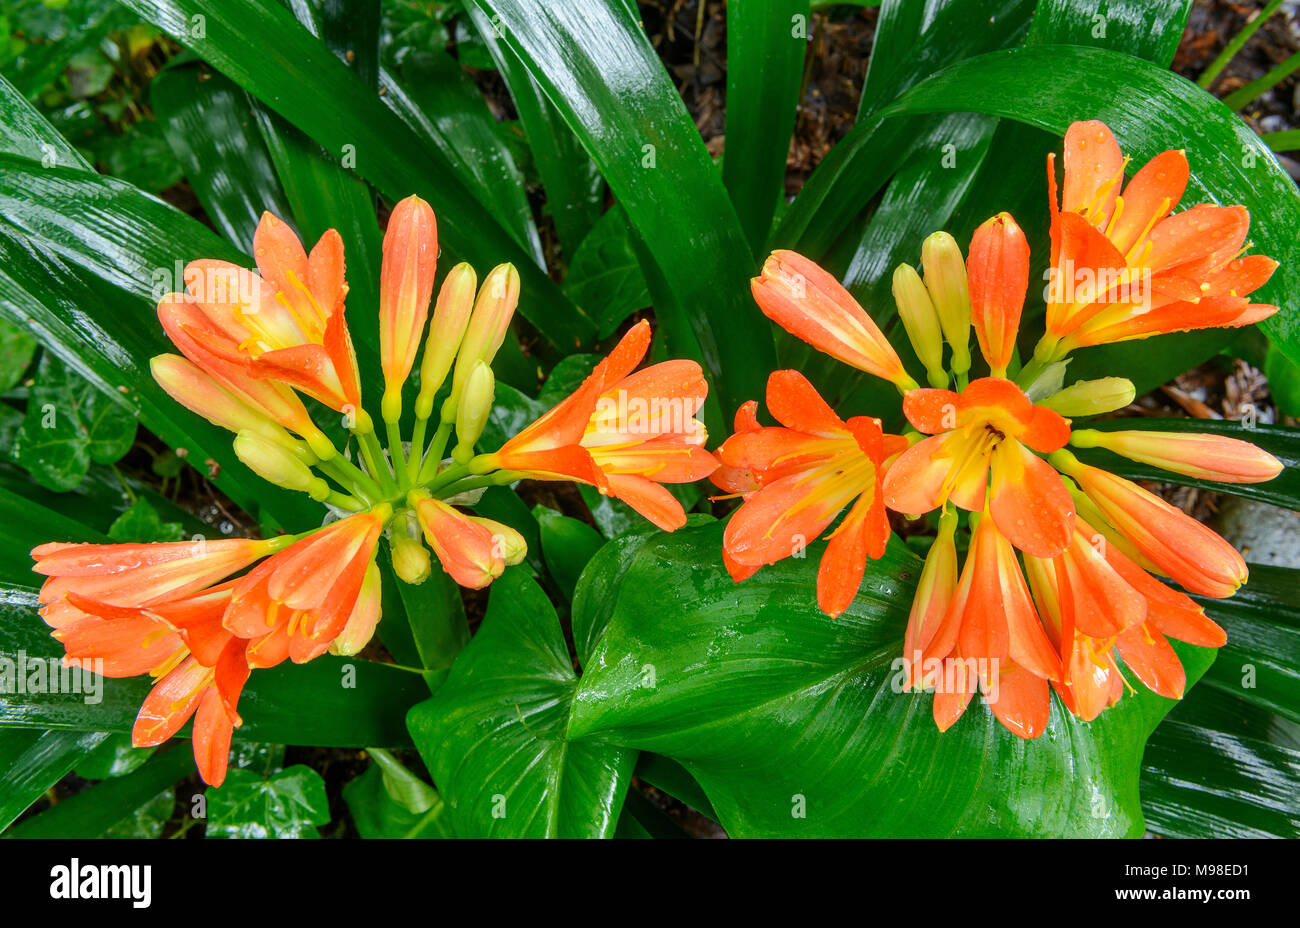 Clivia, Amaryllidaceae, Kaffir Lily, Cypress Garden, Mill Valley, California Immagini Stock